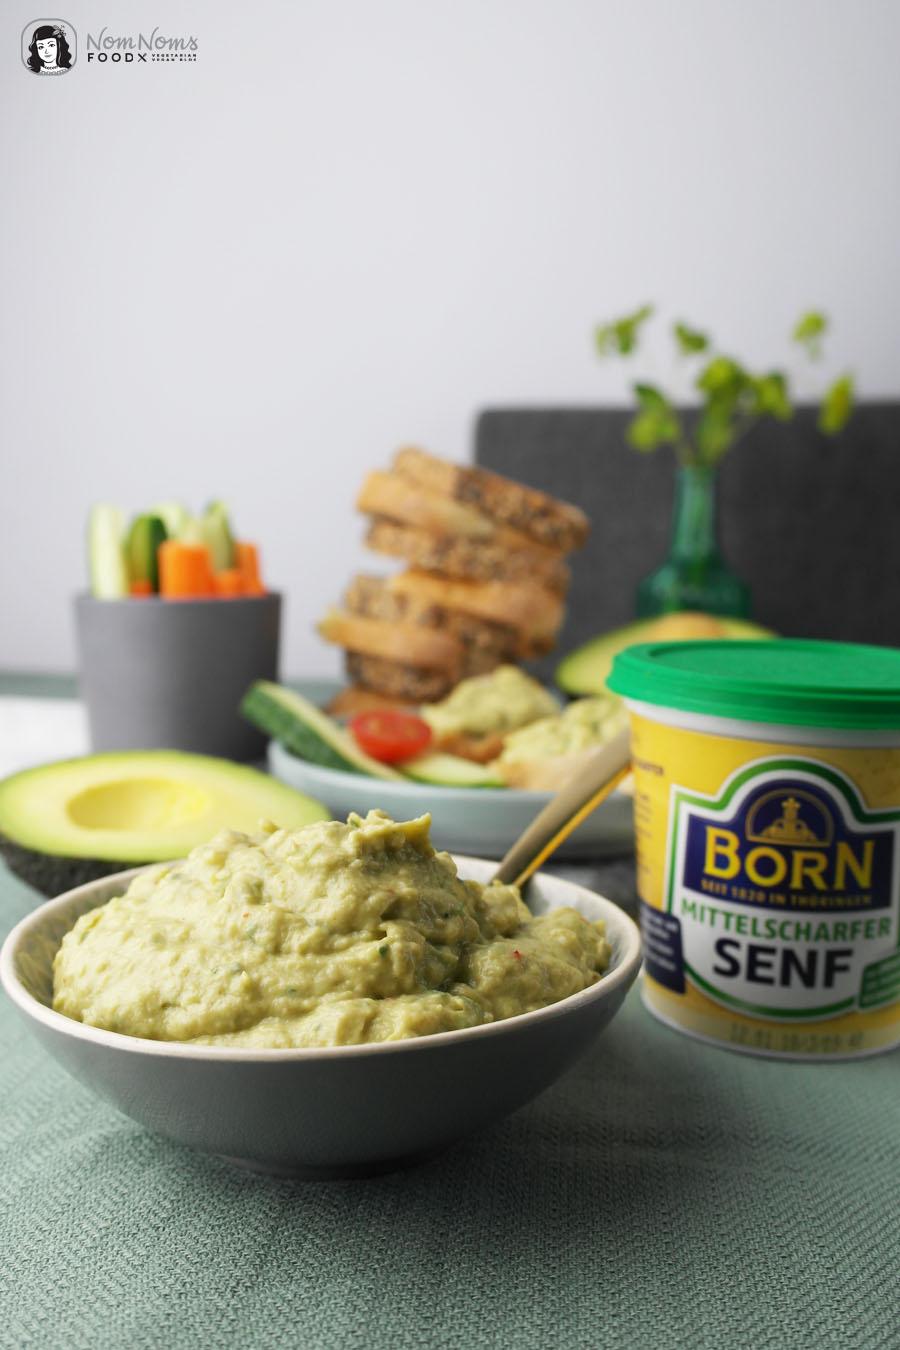 Avocado-Senf-Creme